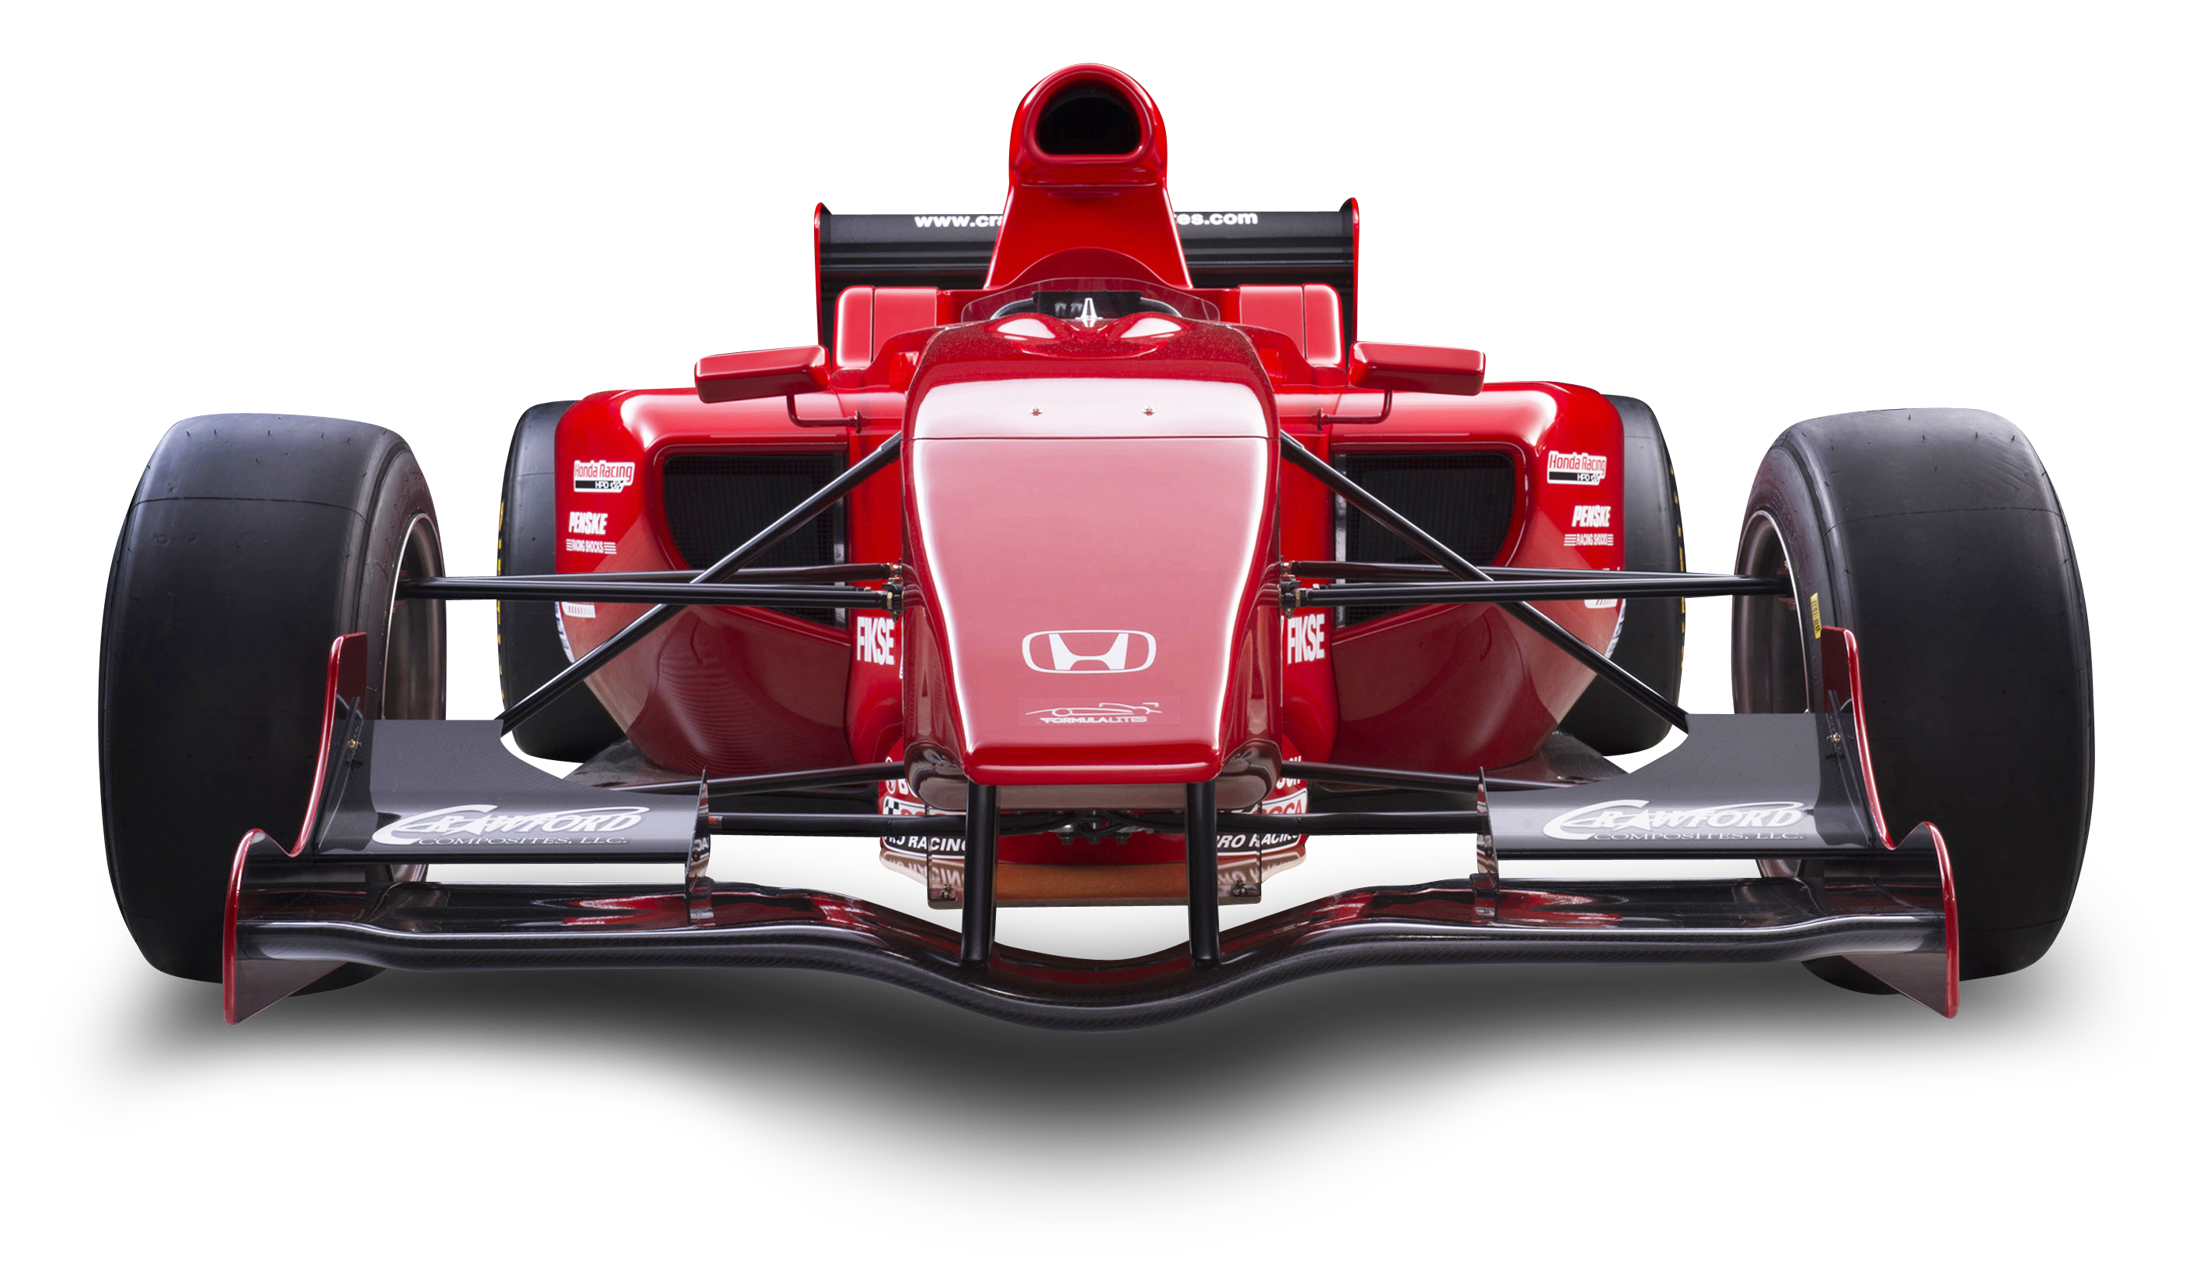 Red Honda Formula Lite Car PNG Image - PngPix clip art free library